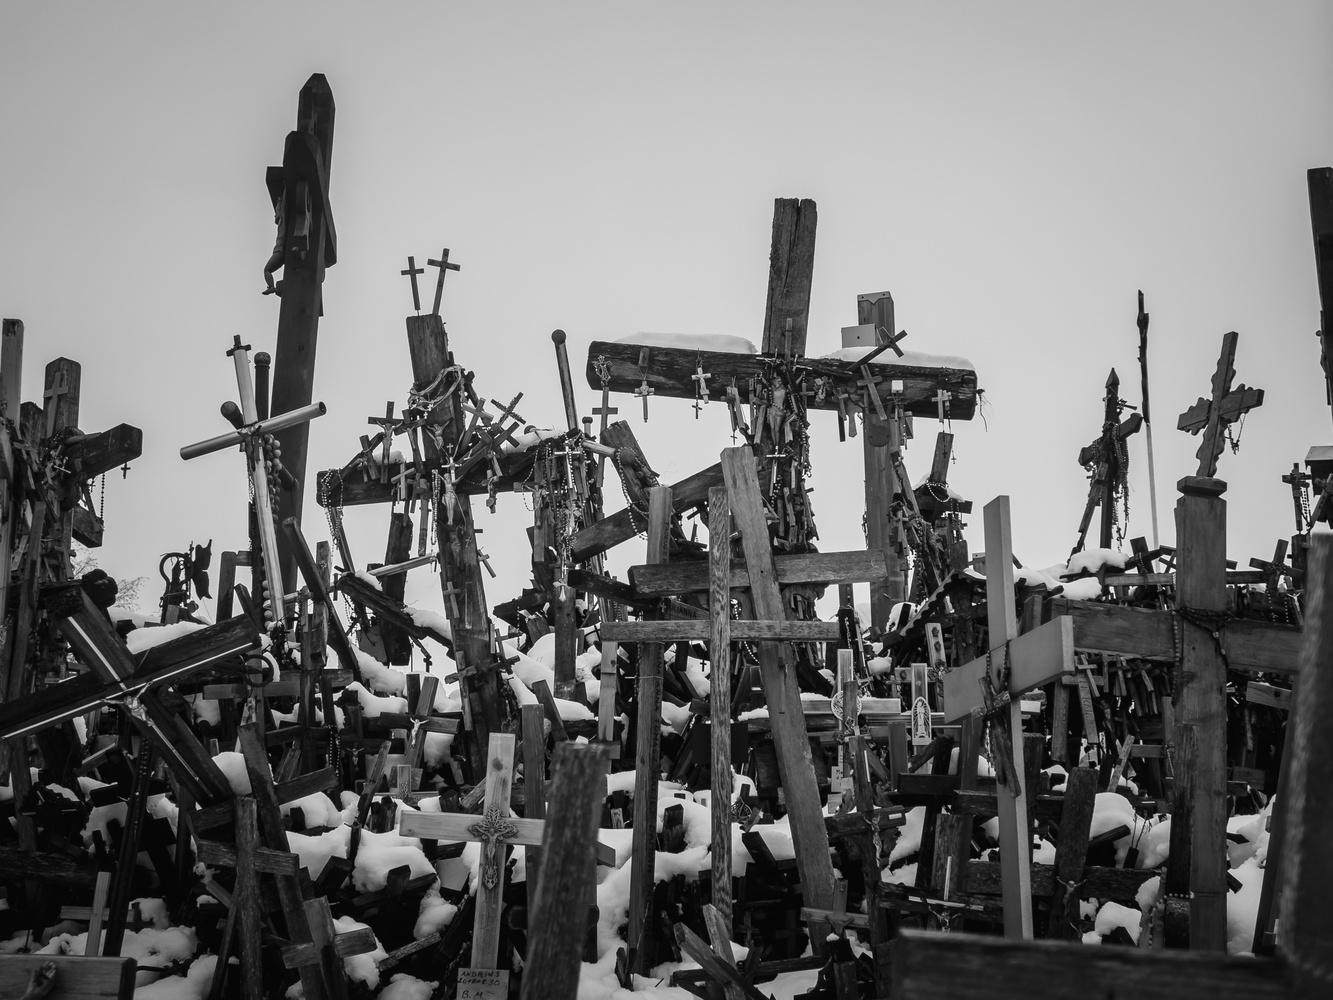 The hill of crosses by Calum Kozma